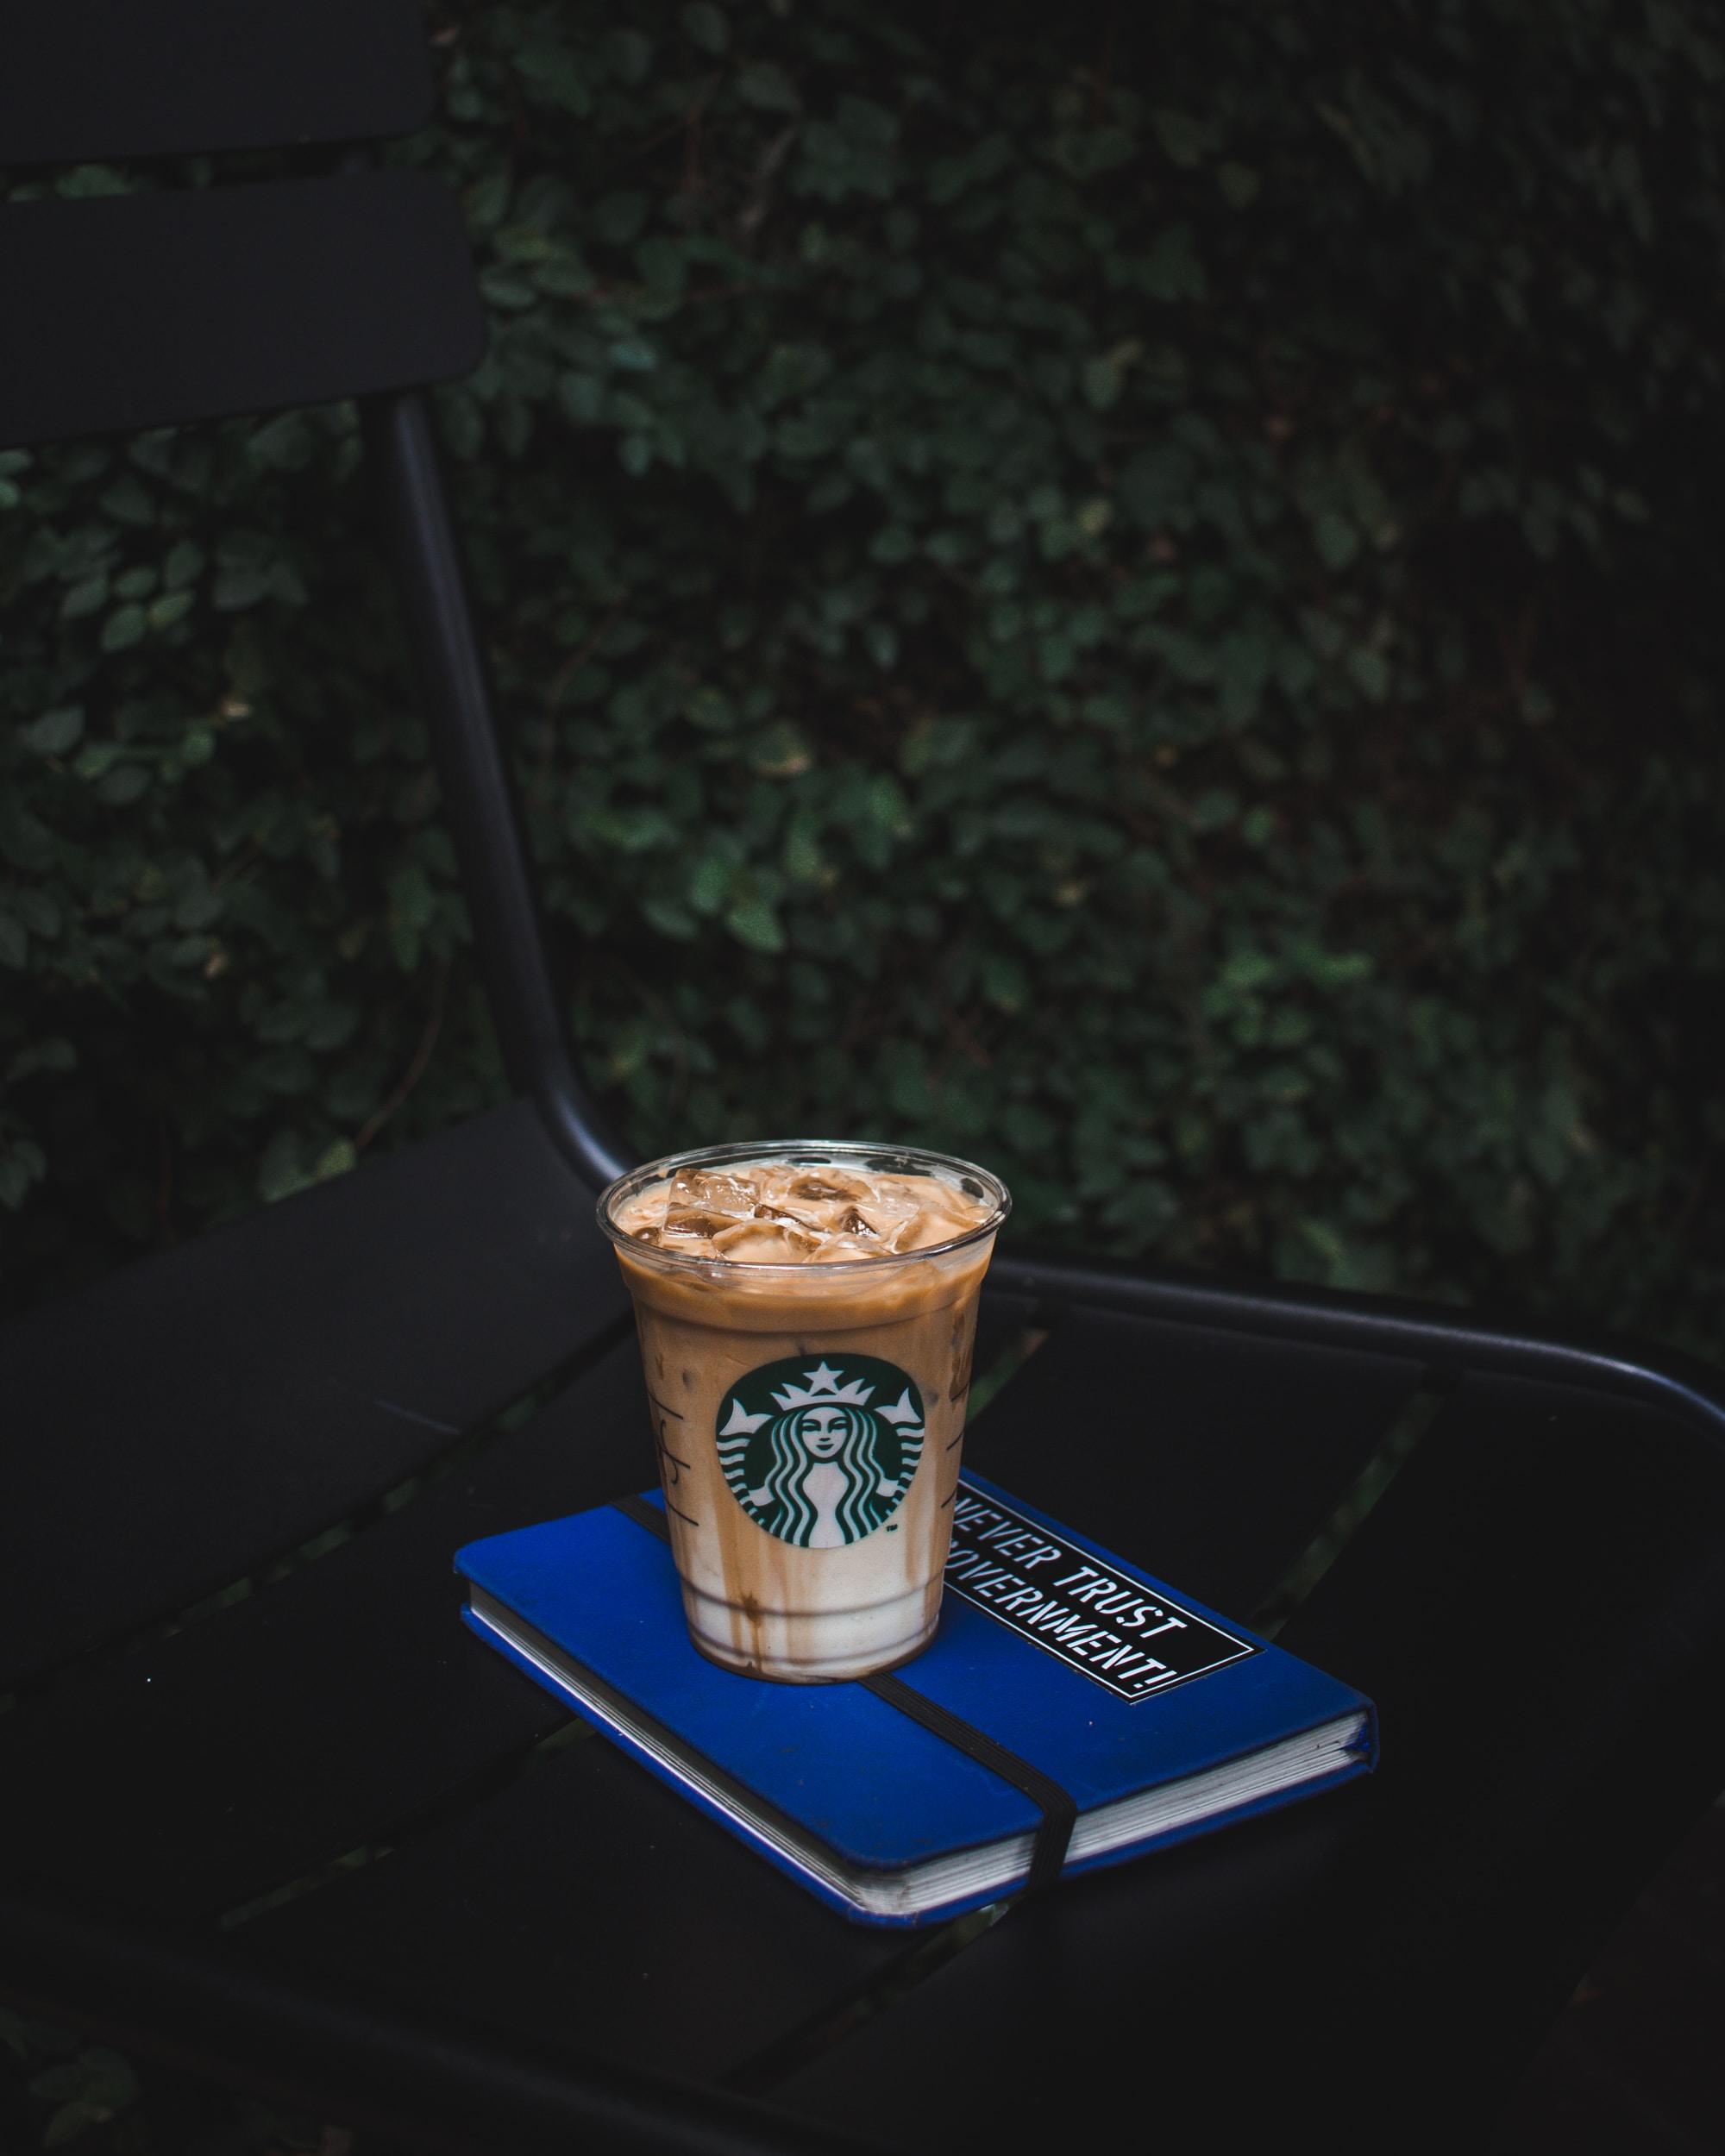 Starbucks plastic cup on blue book